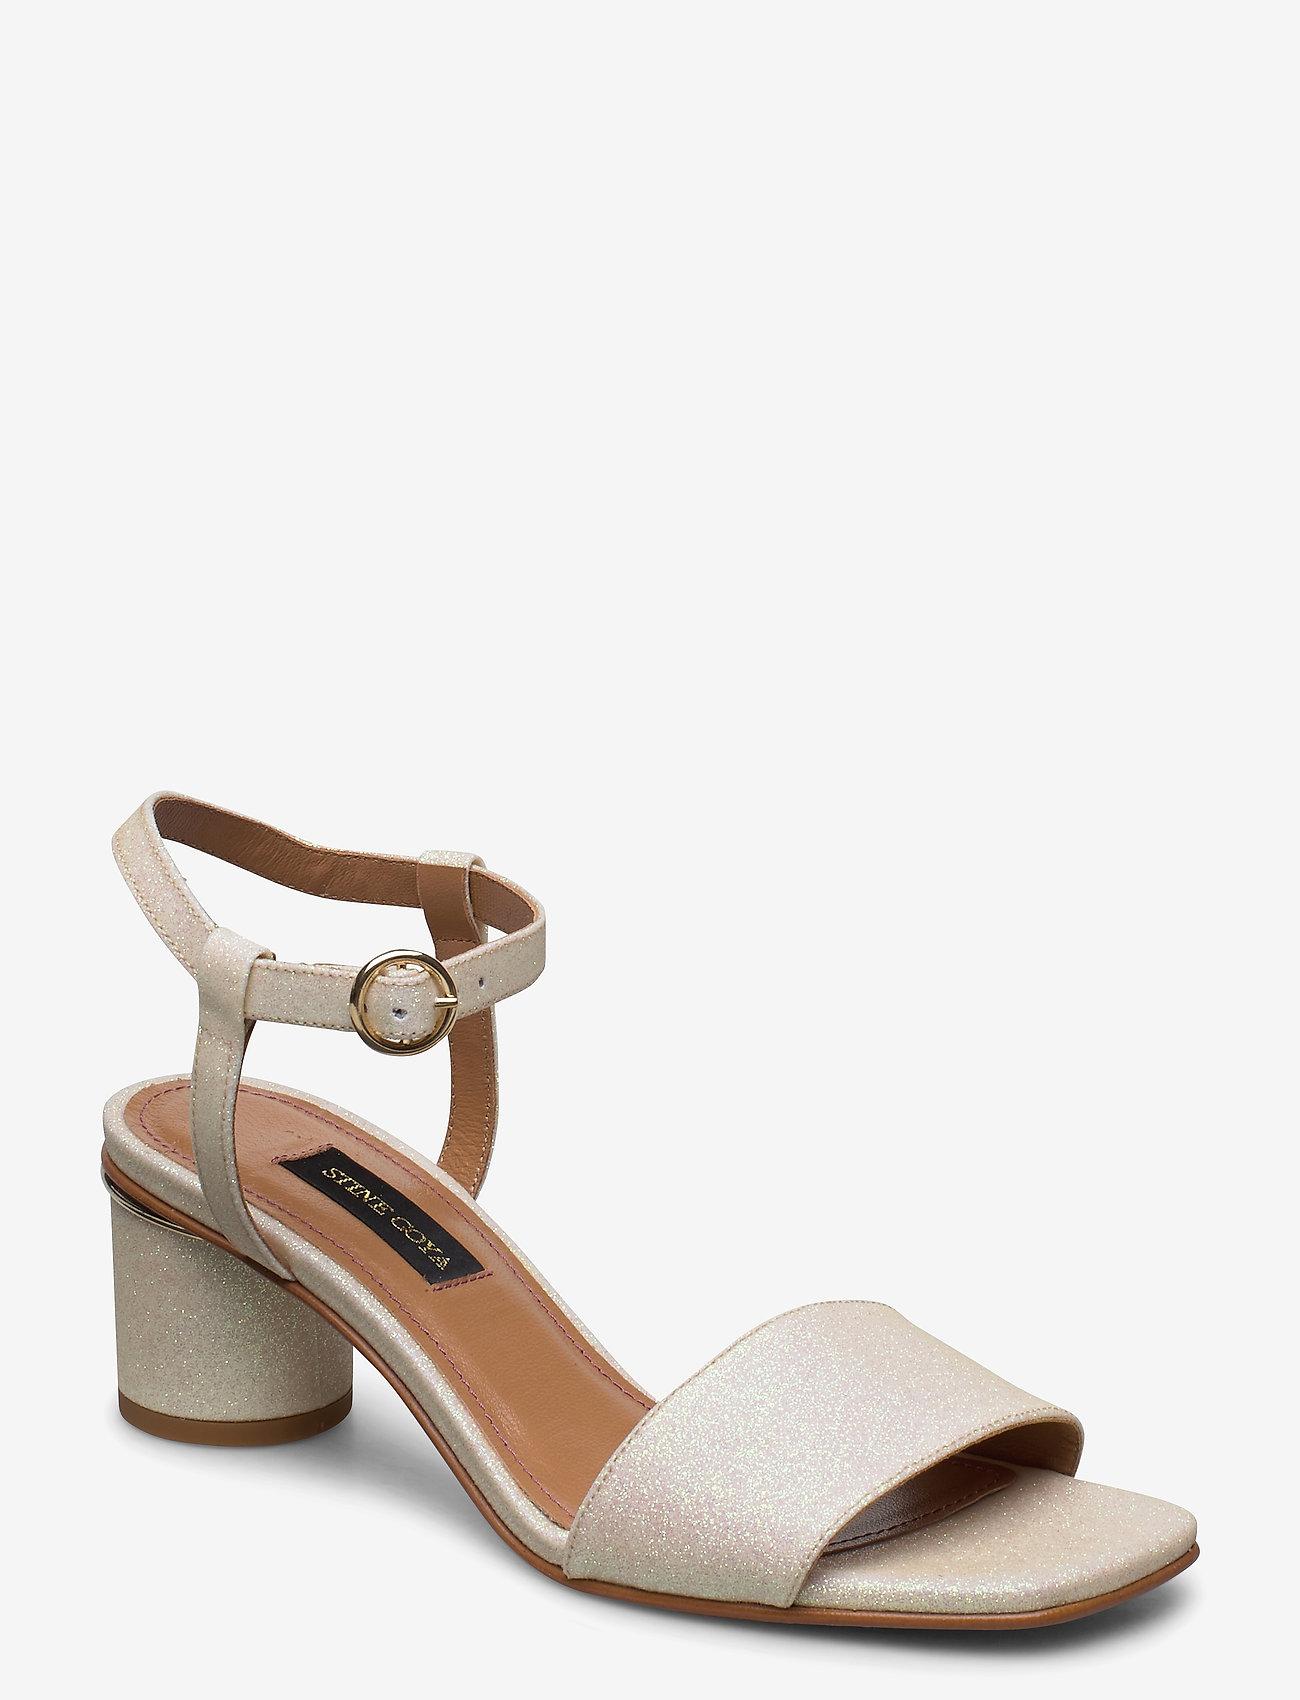 Oda, 884 Glitter Shoes (Champagne